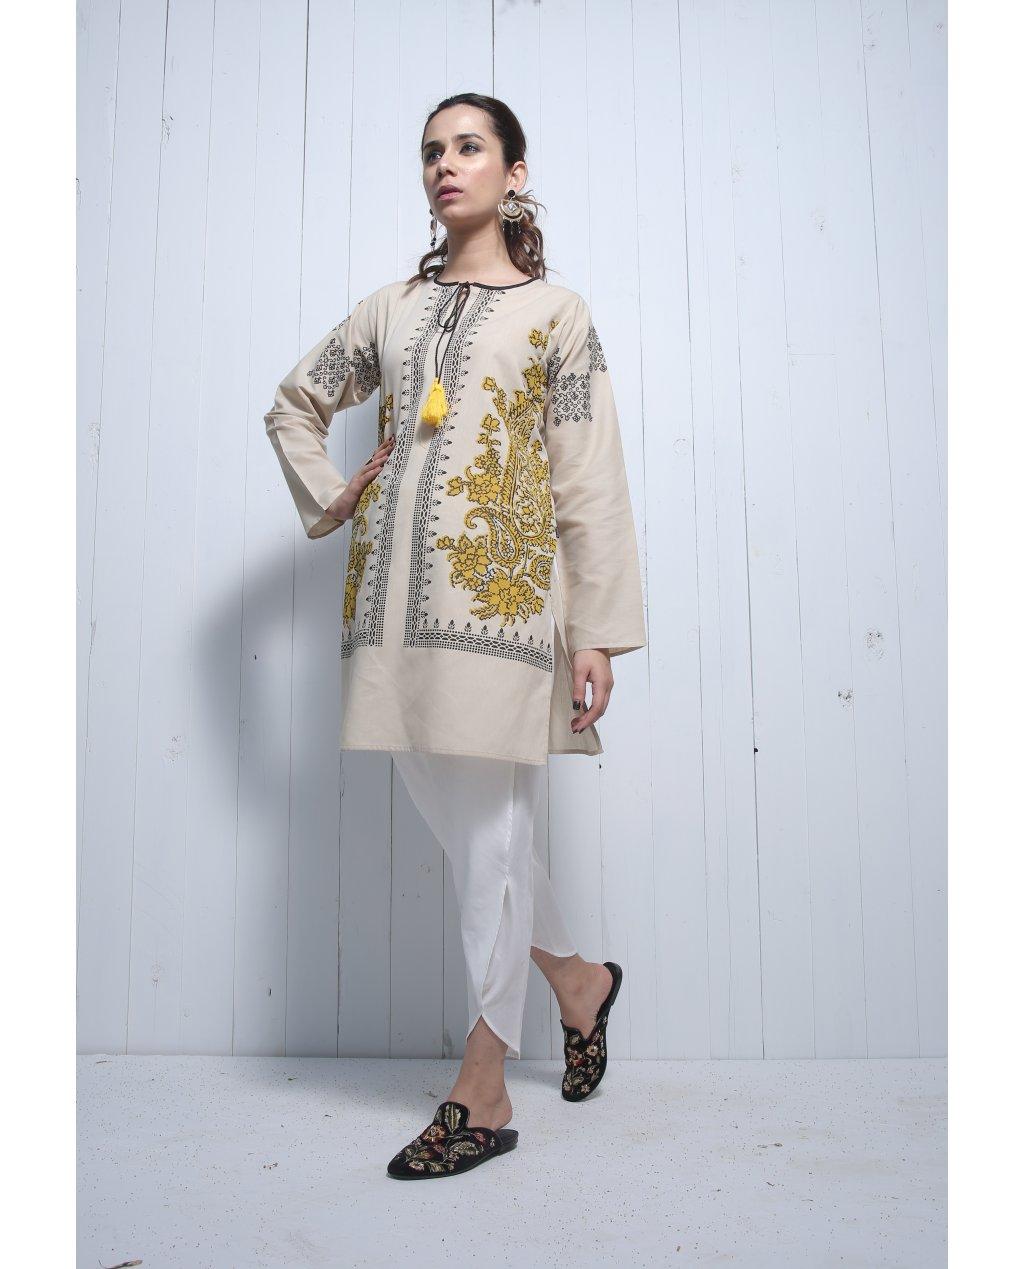 EGO Winter Ladies Kurta Designs Collection 2018-19 Trends